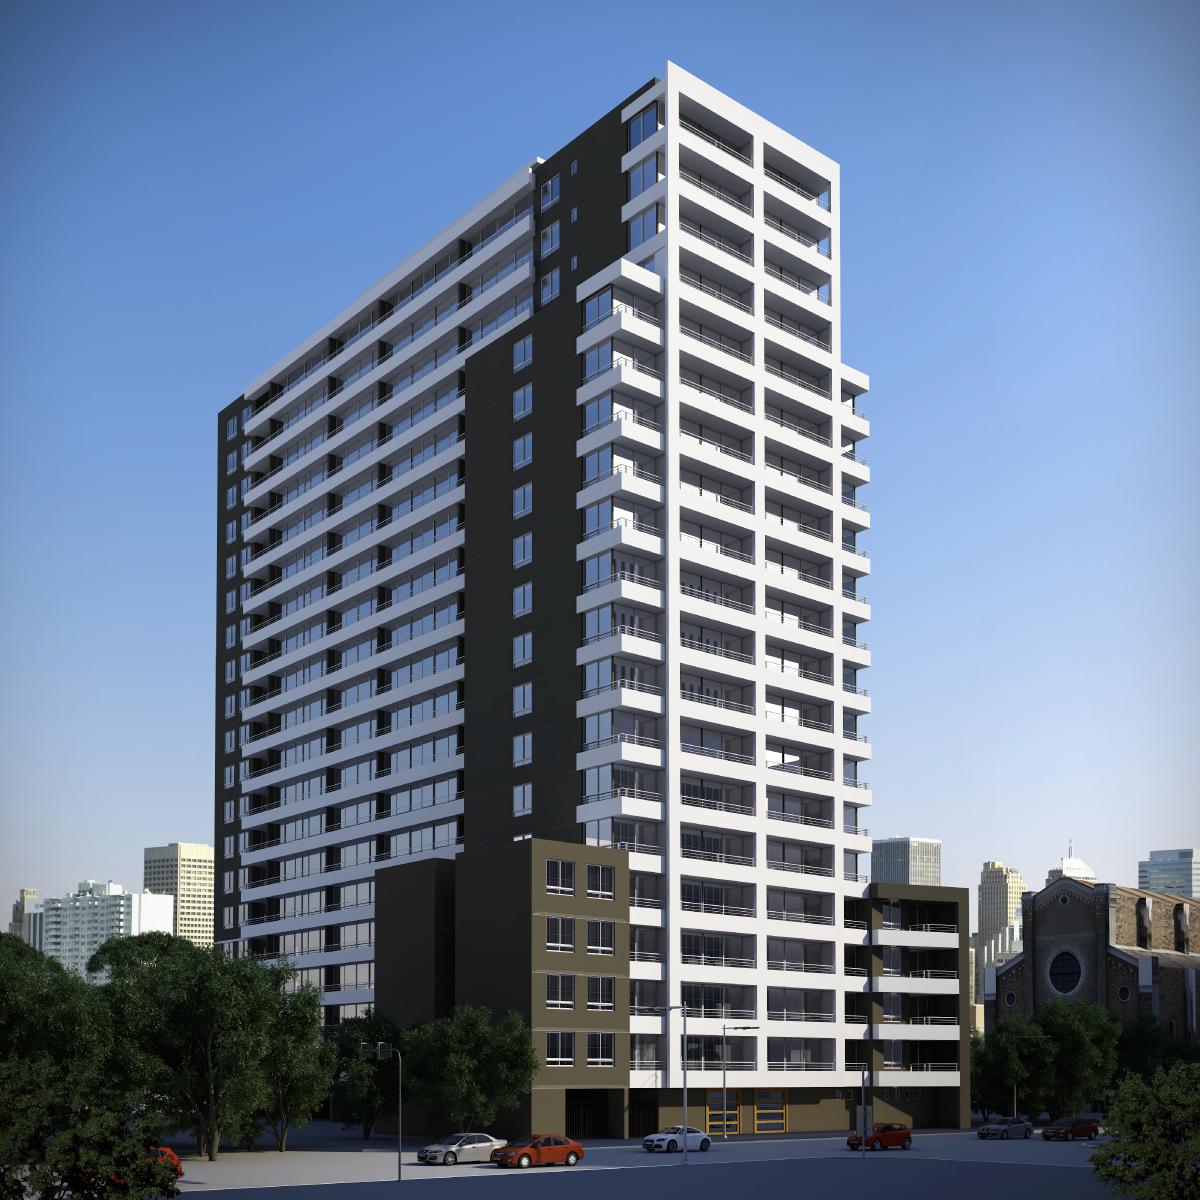 https://proyectainmobiliaria.cl/wp-content/uploads/2021/03/fachada-olivos.jpg